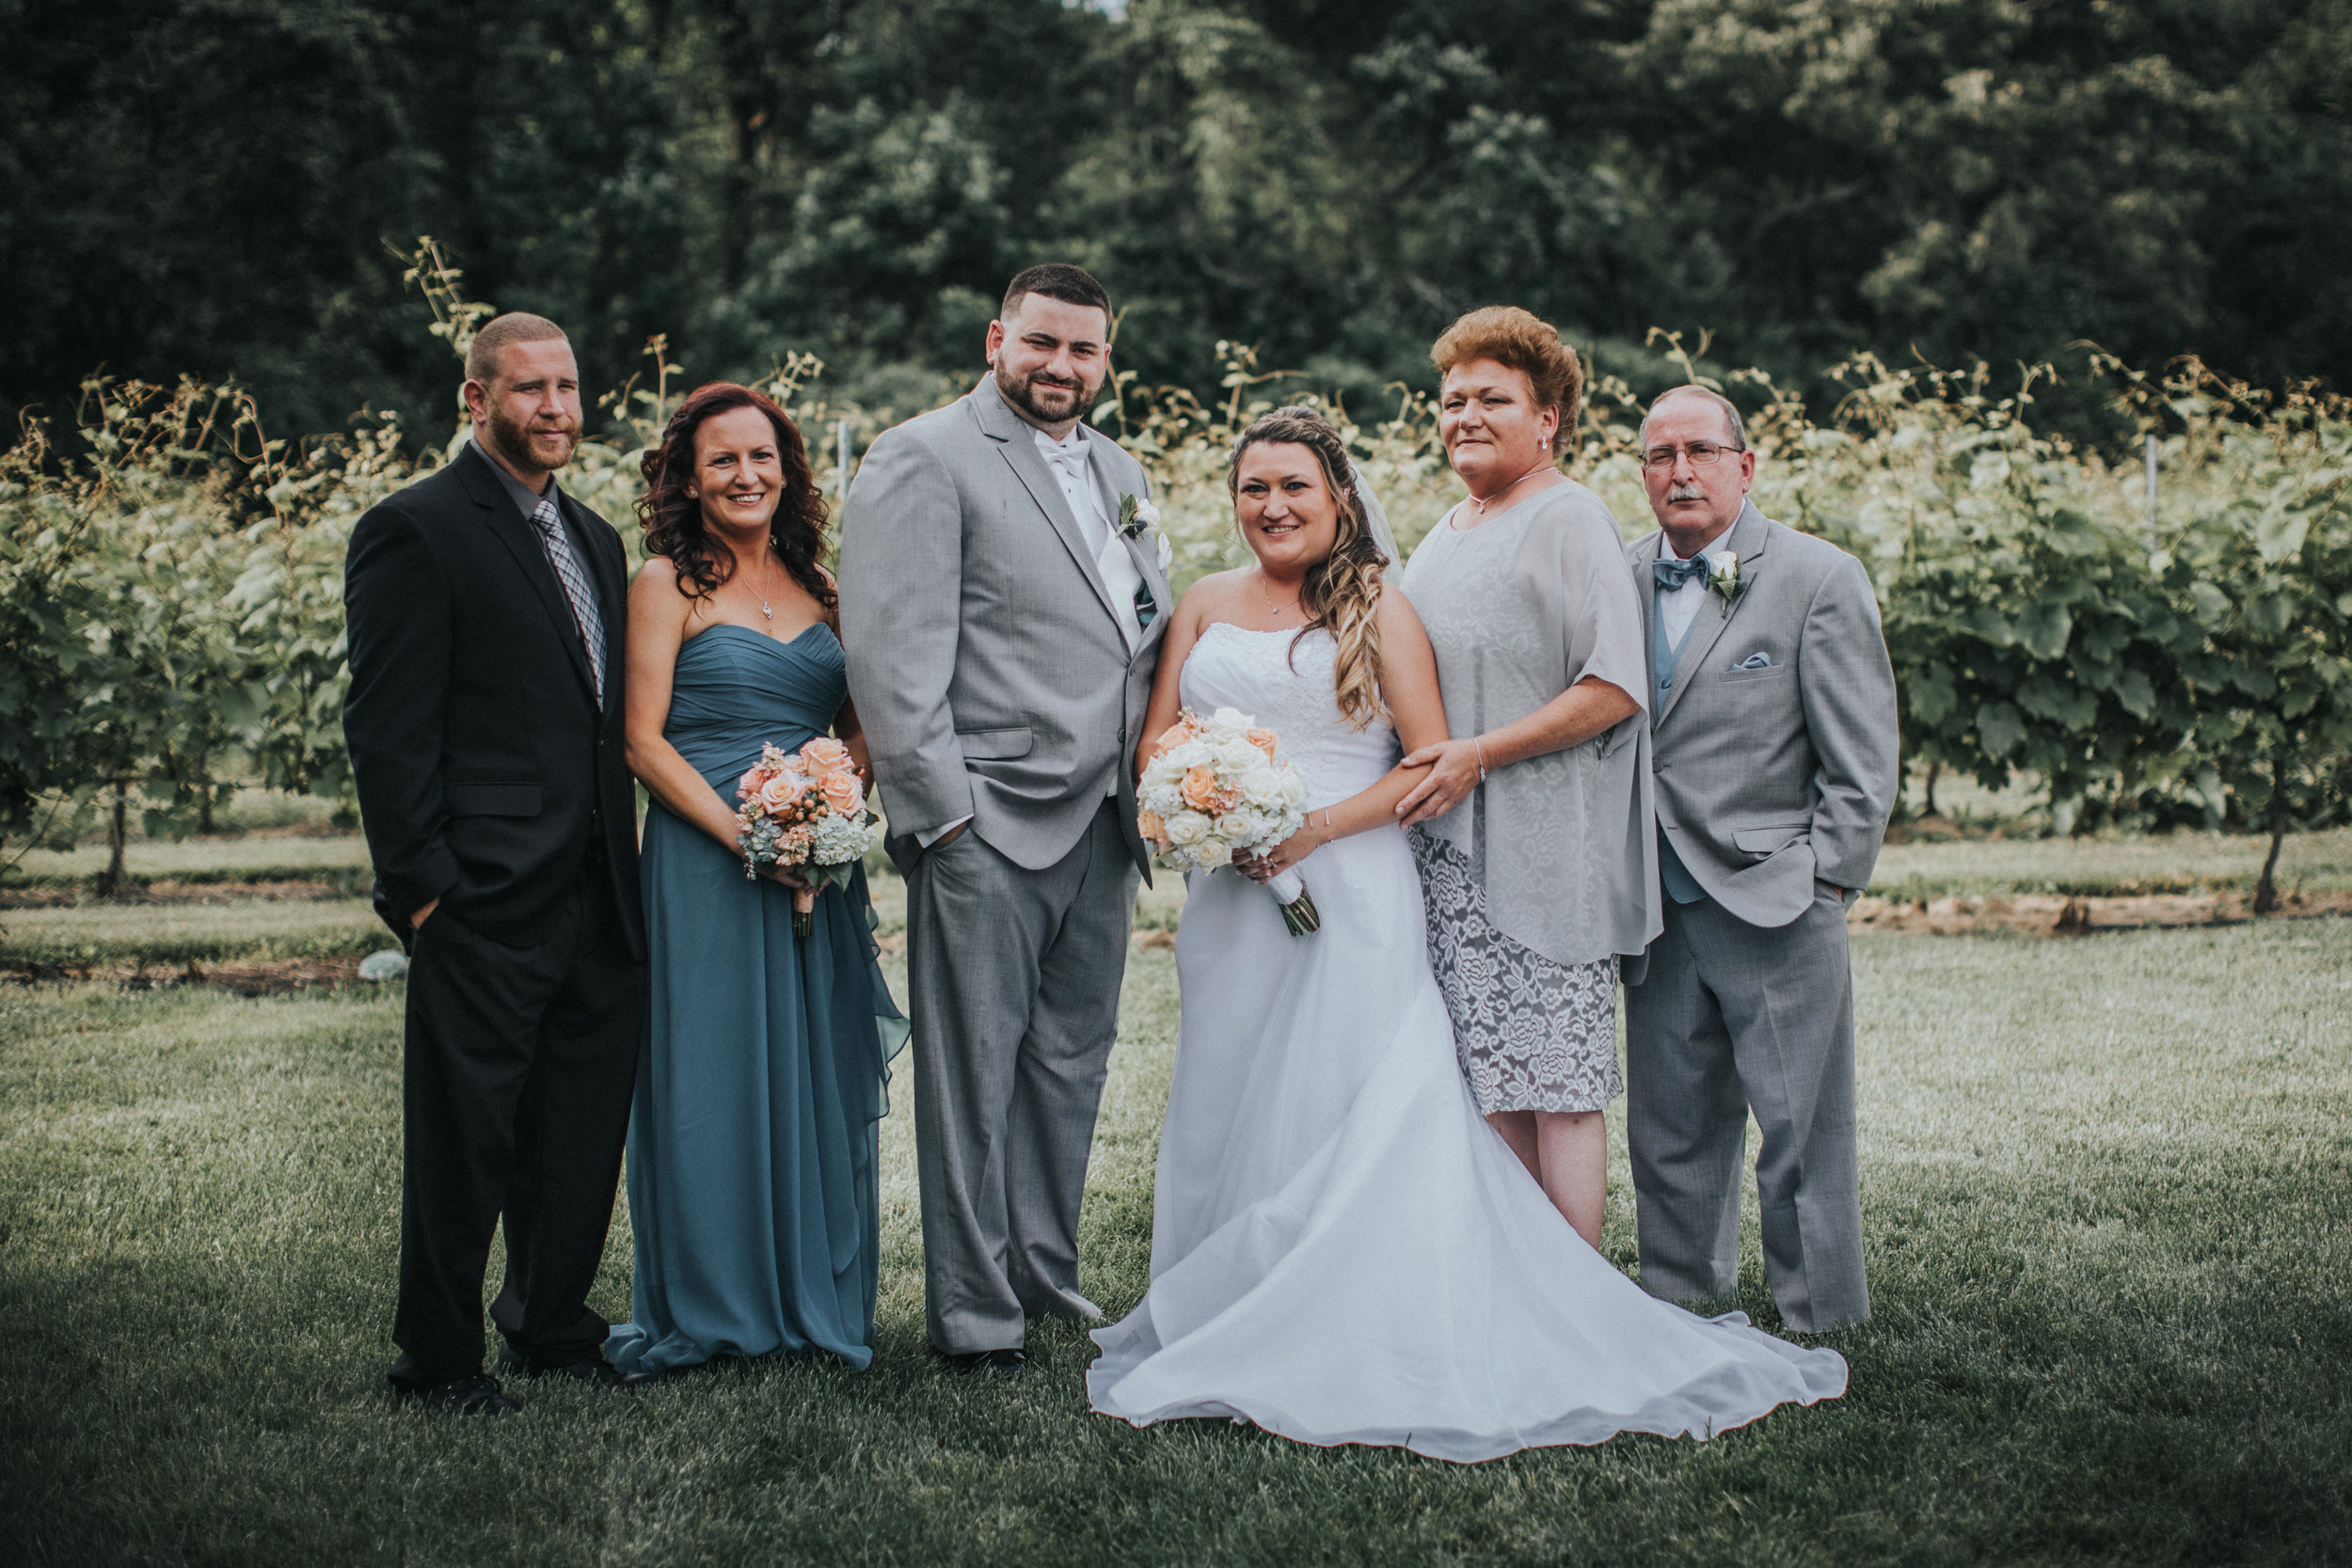 New-Jersey-Wedding-Photographer-JennaLynnPhotography-ValenzanoWinery-Family-34.jpg